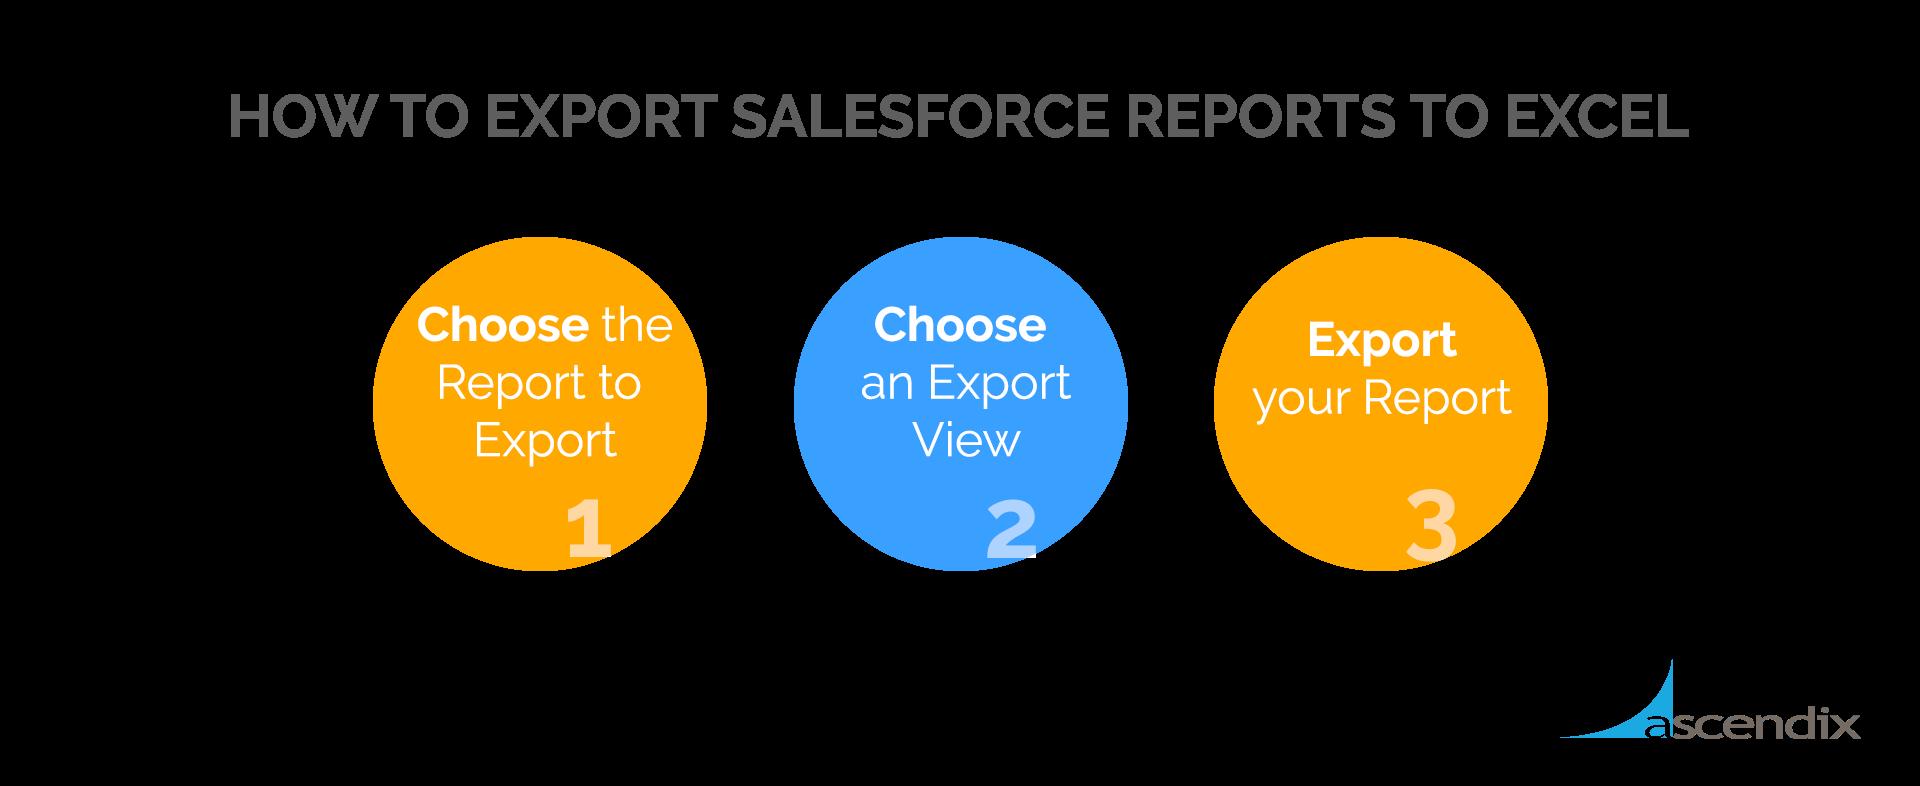 How to Export Salesforce Report to Excel